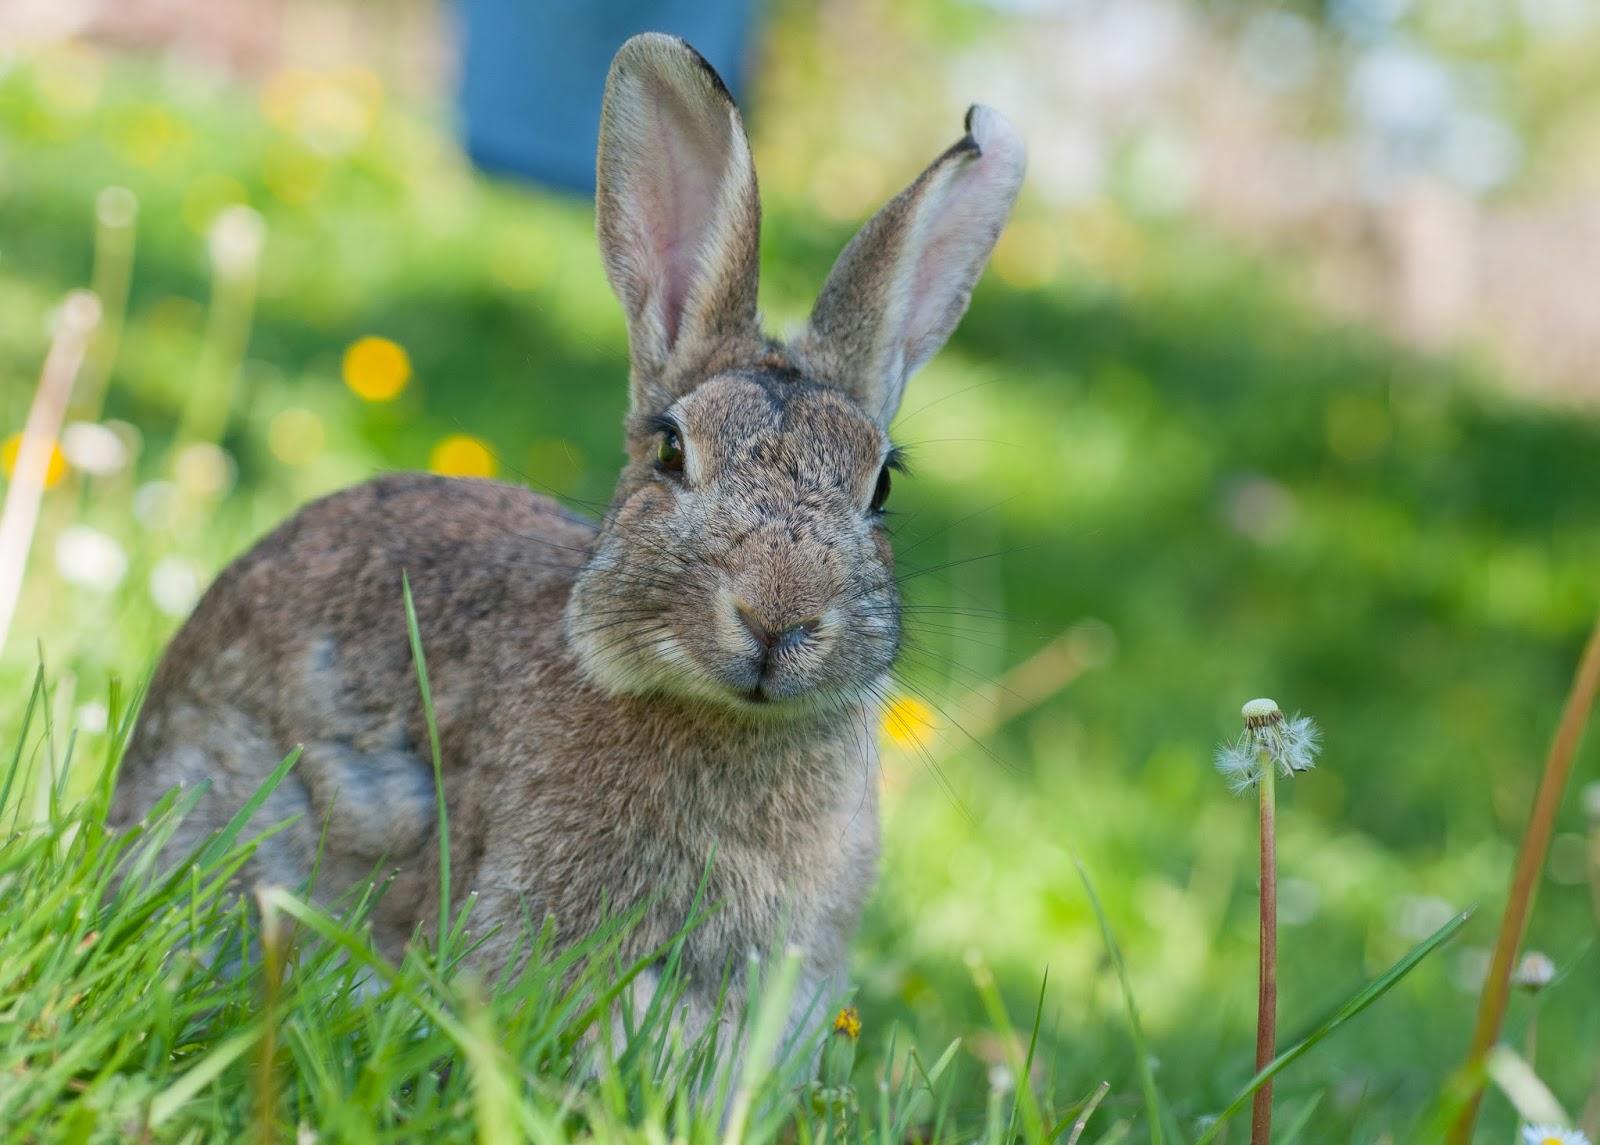 Wild life trip lapin de garenne peu farouche - Cuisiner un lapin de garenne ...